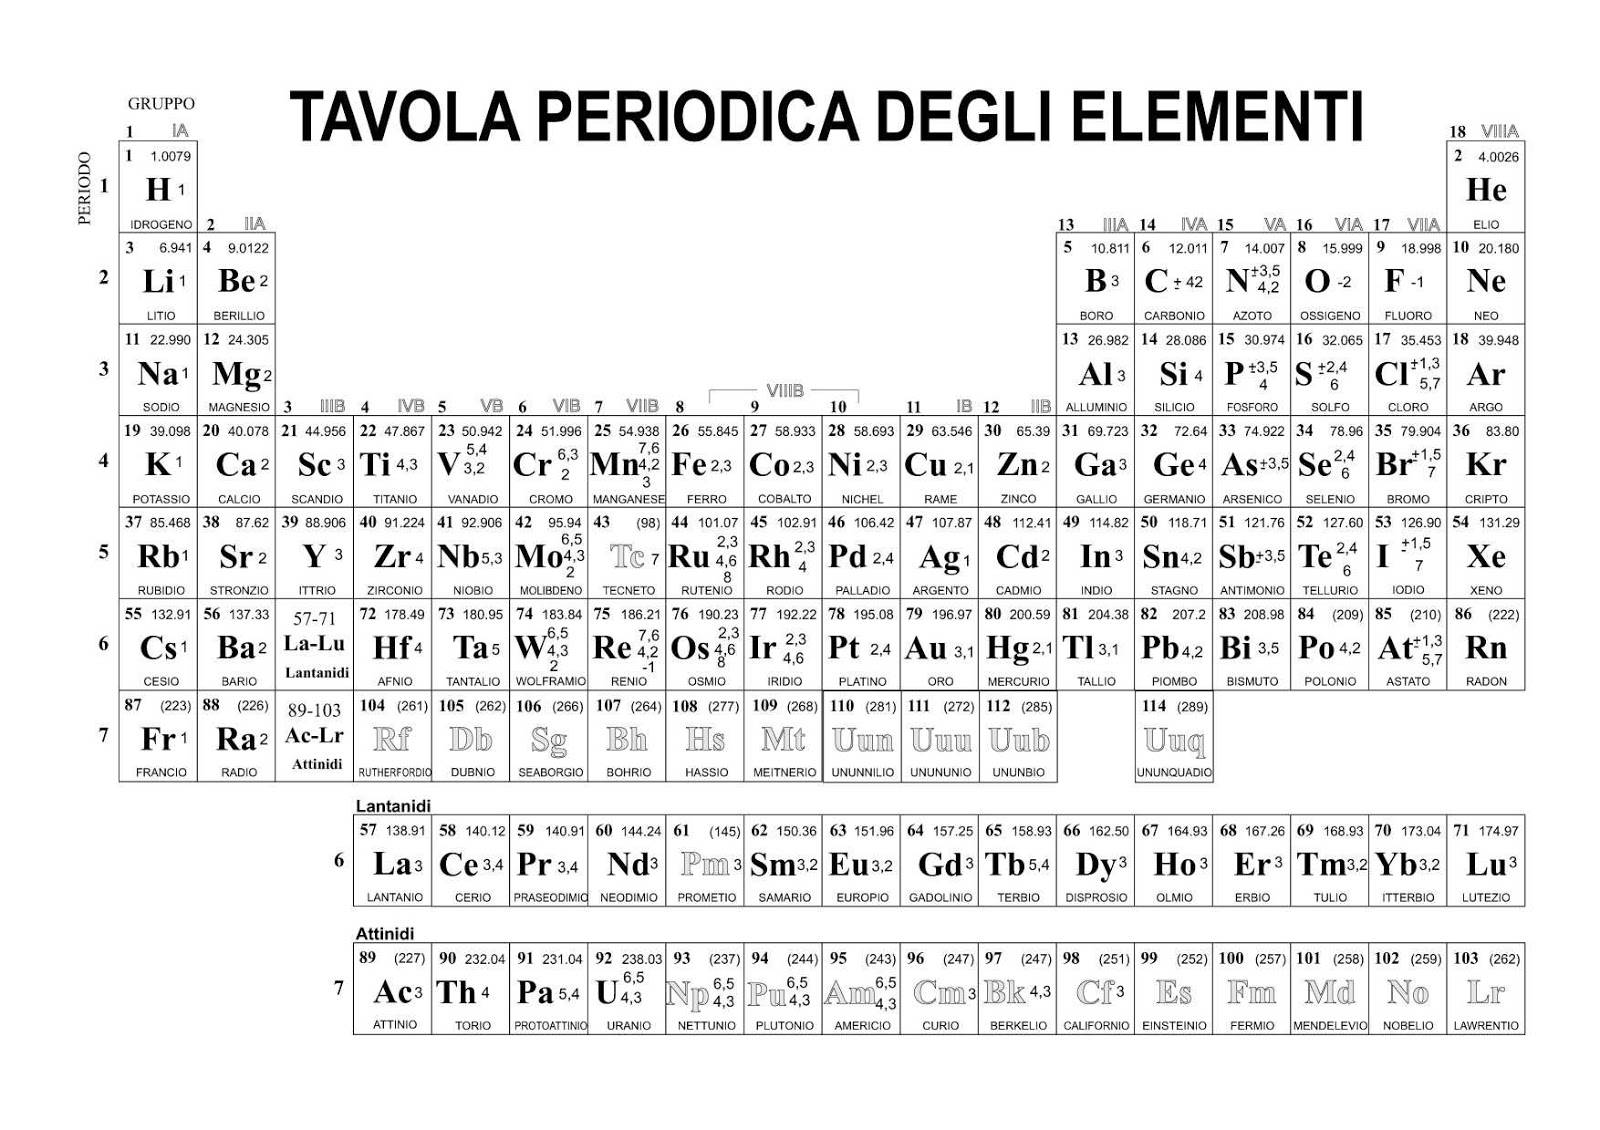 The chemistry of elements tavola periodica degli elementi - Quanti sono gli elementi della tavola periodica ...